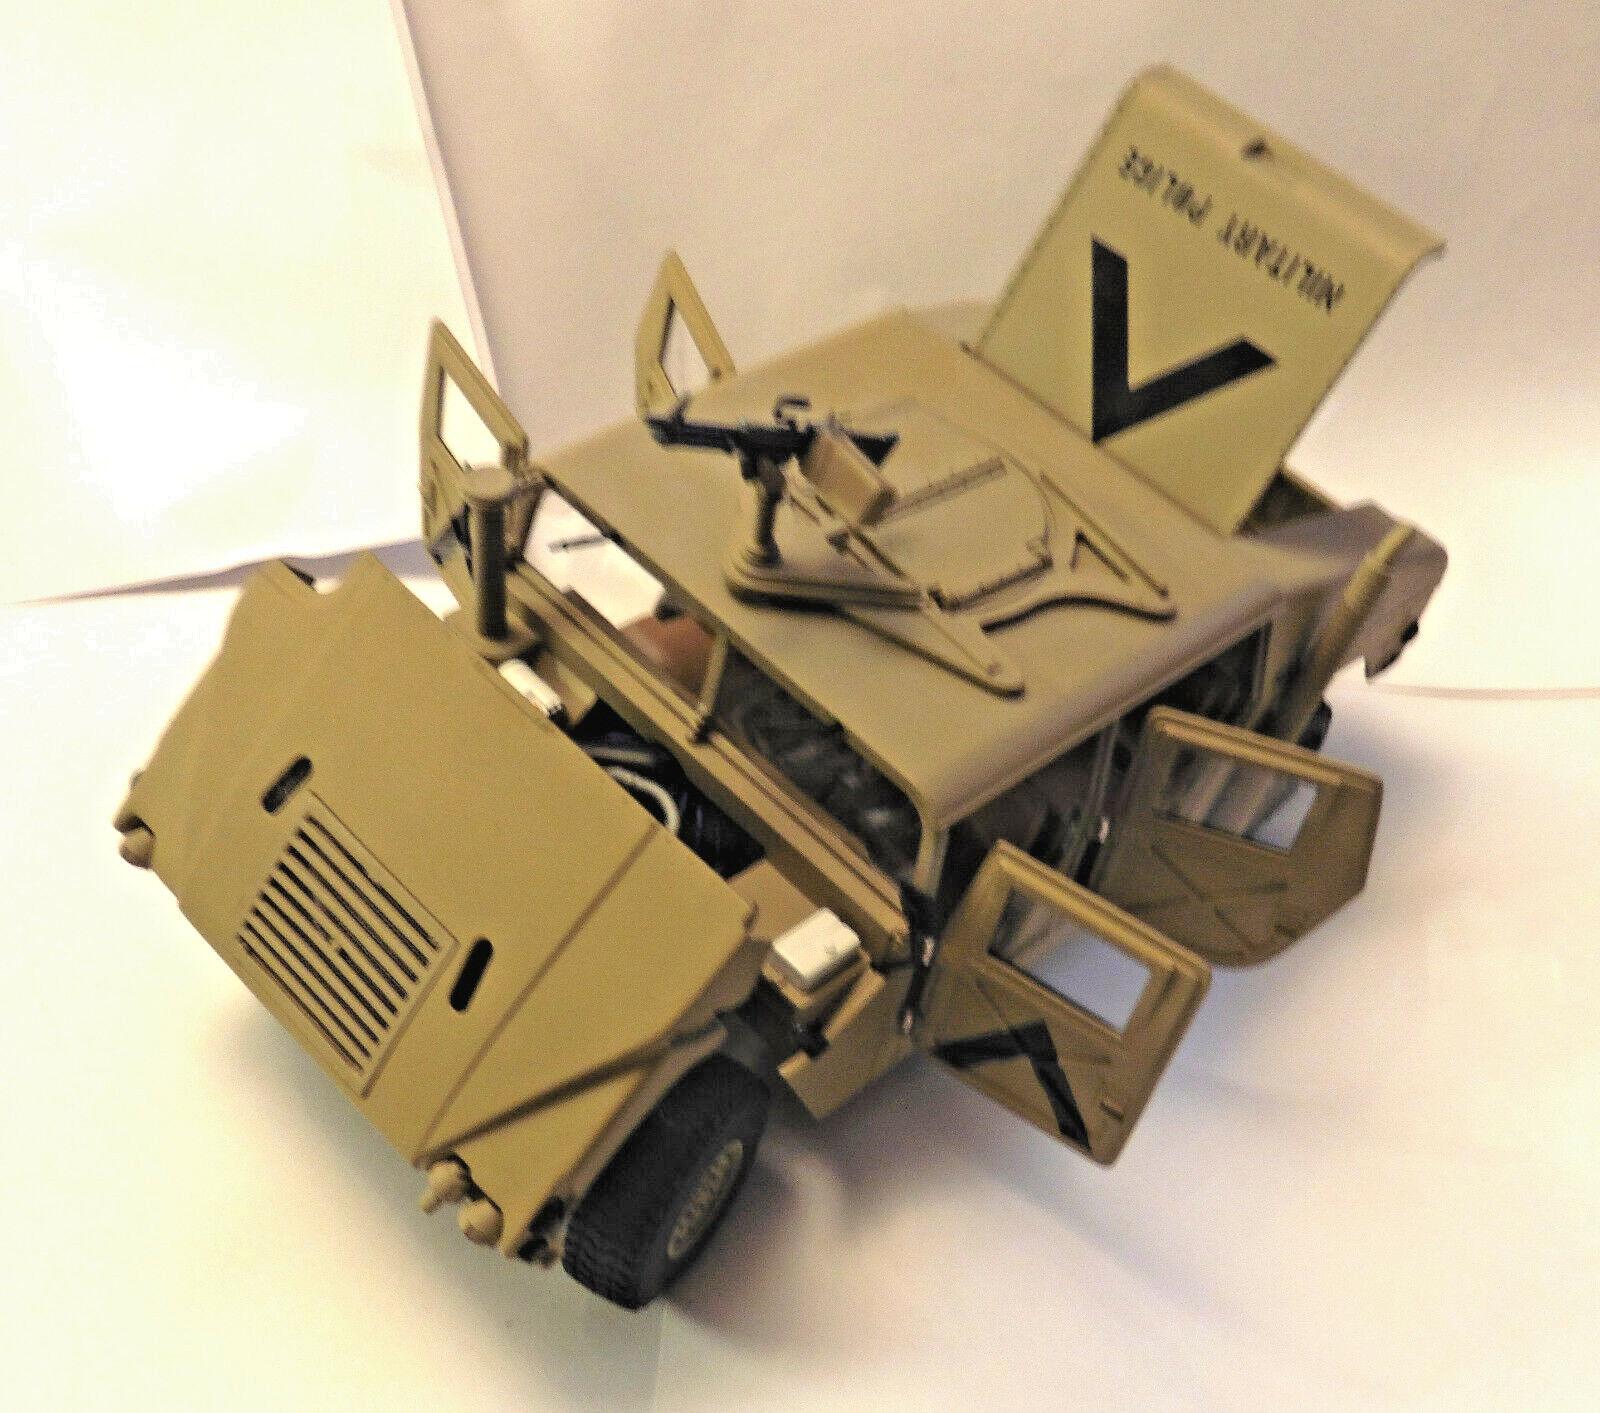 RARE Exoto AM General Humvee 1995, Military Desert Storm (Battle Sand),1 18,mint